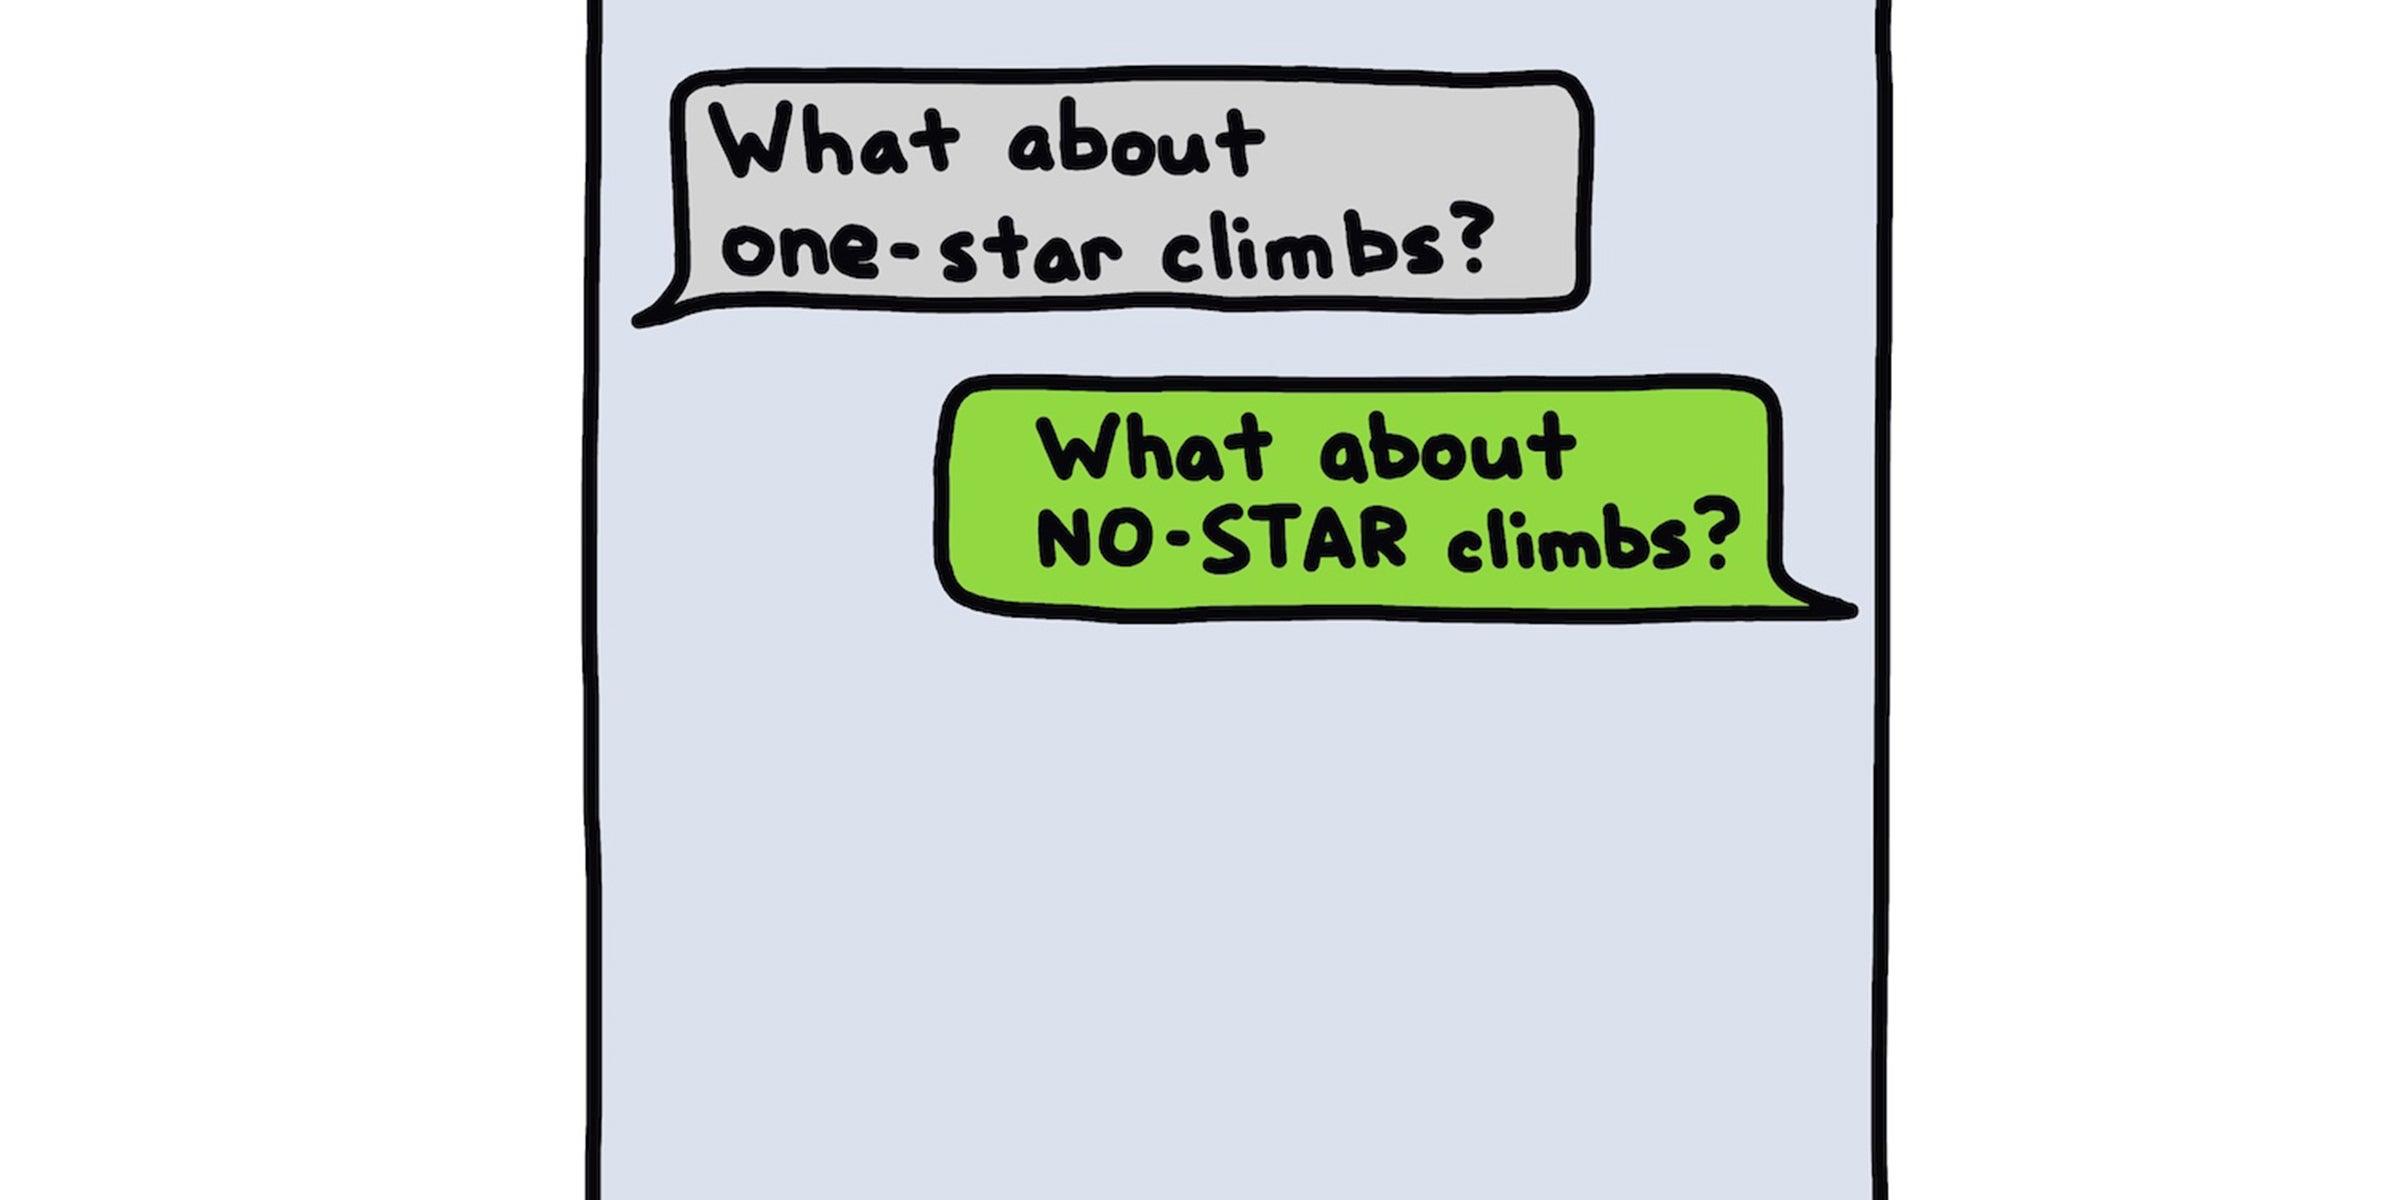 No star climbs text conversation